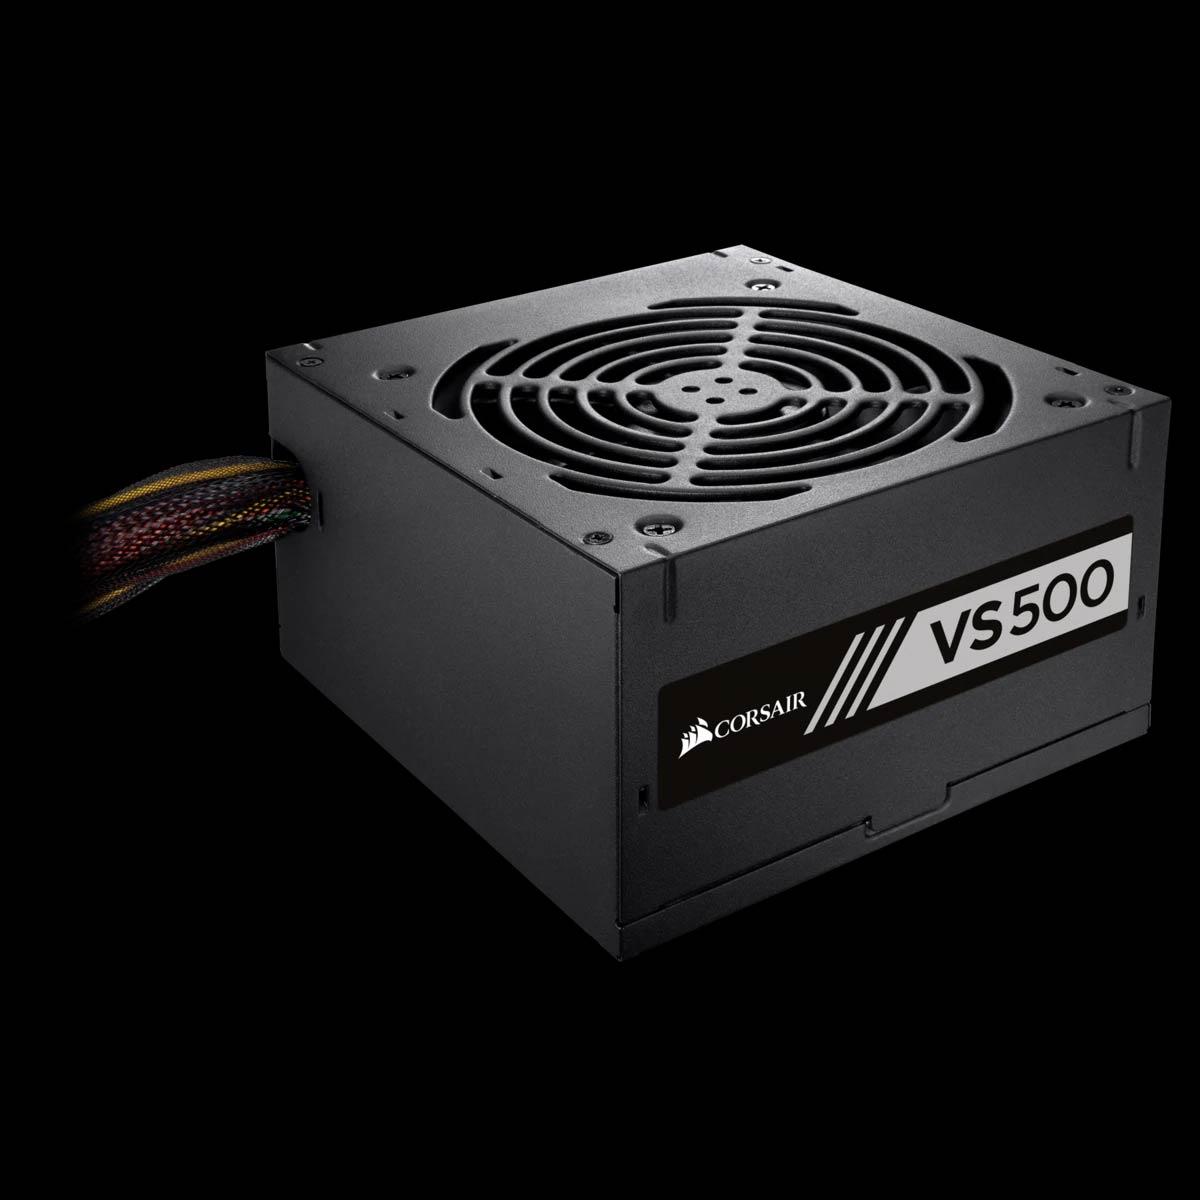 Fonte ATX 500W - VS500 - 80 Plus White Pfc Ativo